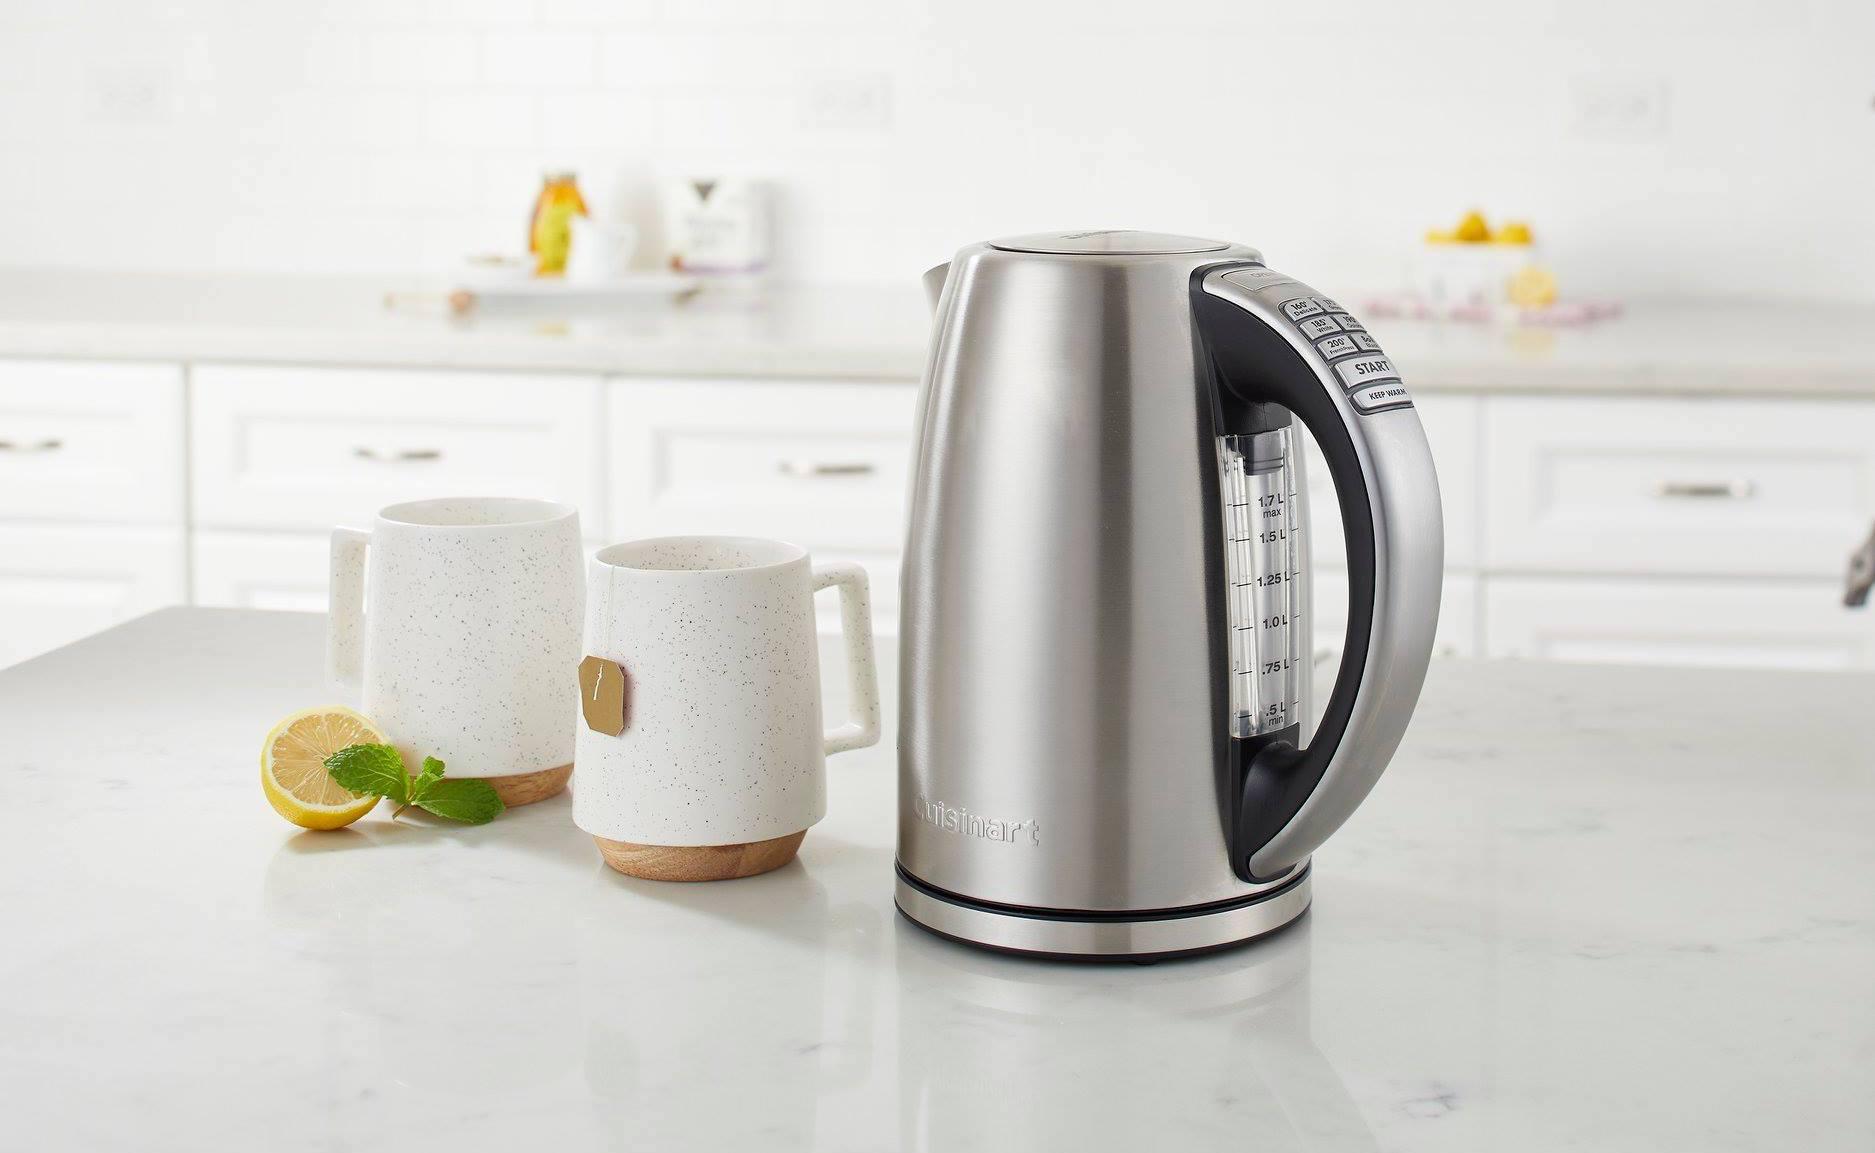 Cuisinart PerfecTemp Cordless Electric Kettle Stainless Steel Teakettle has 6 exact temperature settings